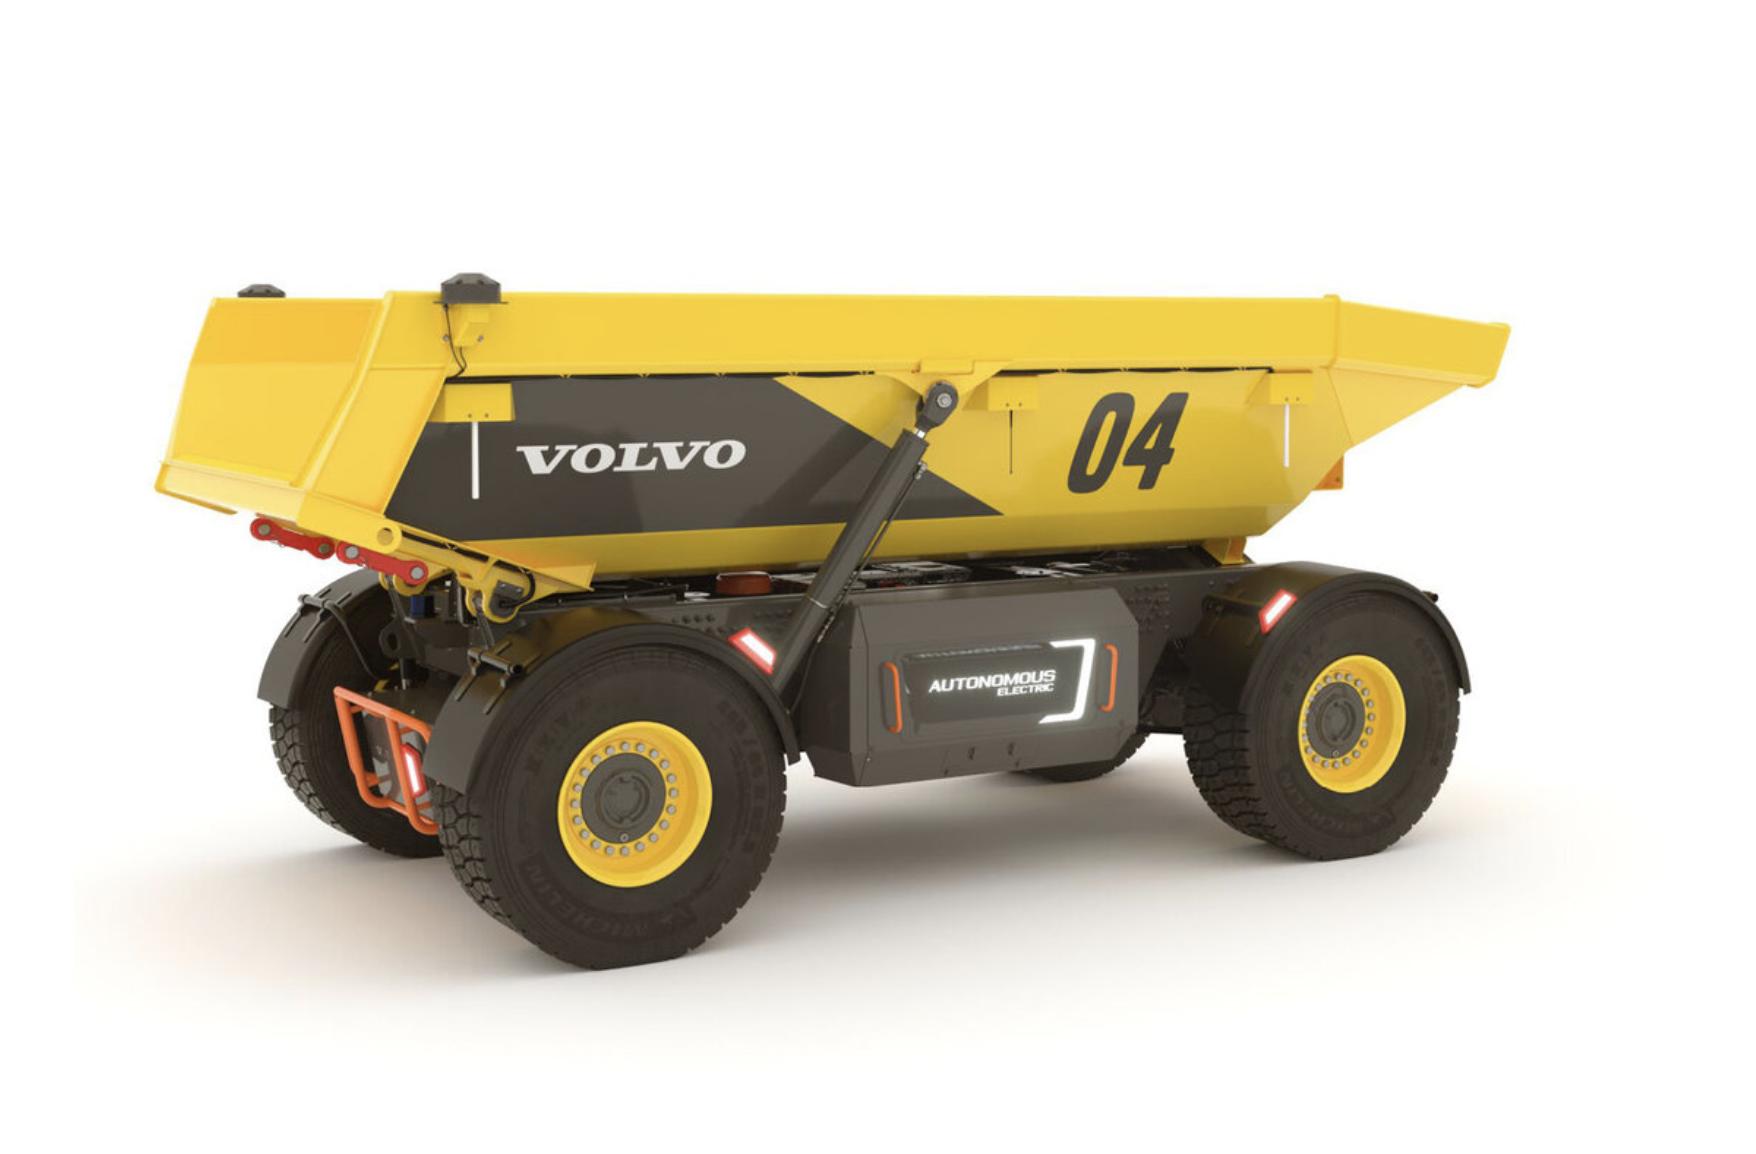 Volvo TA15